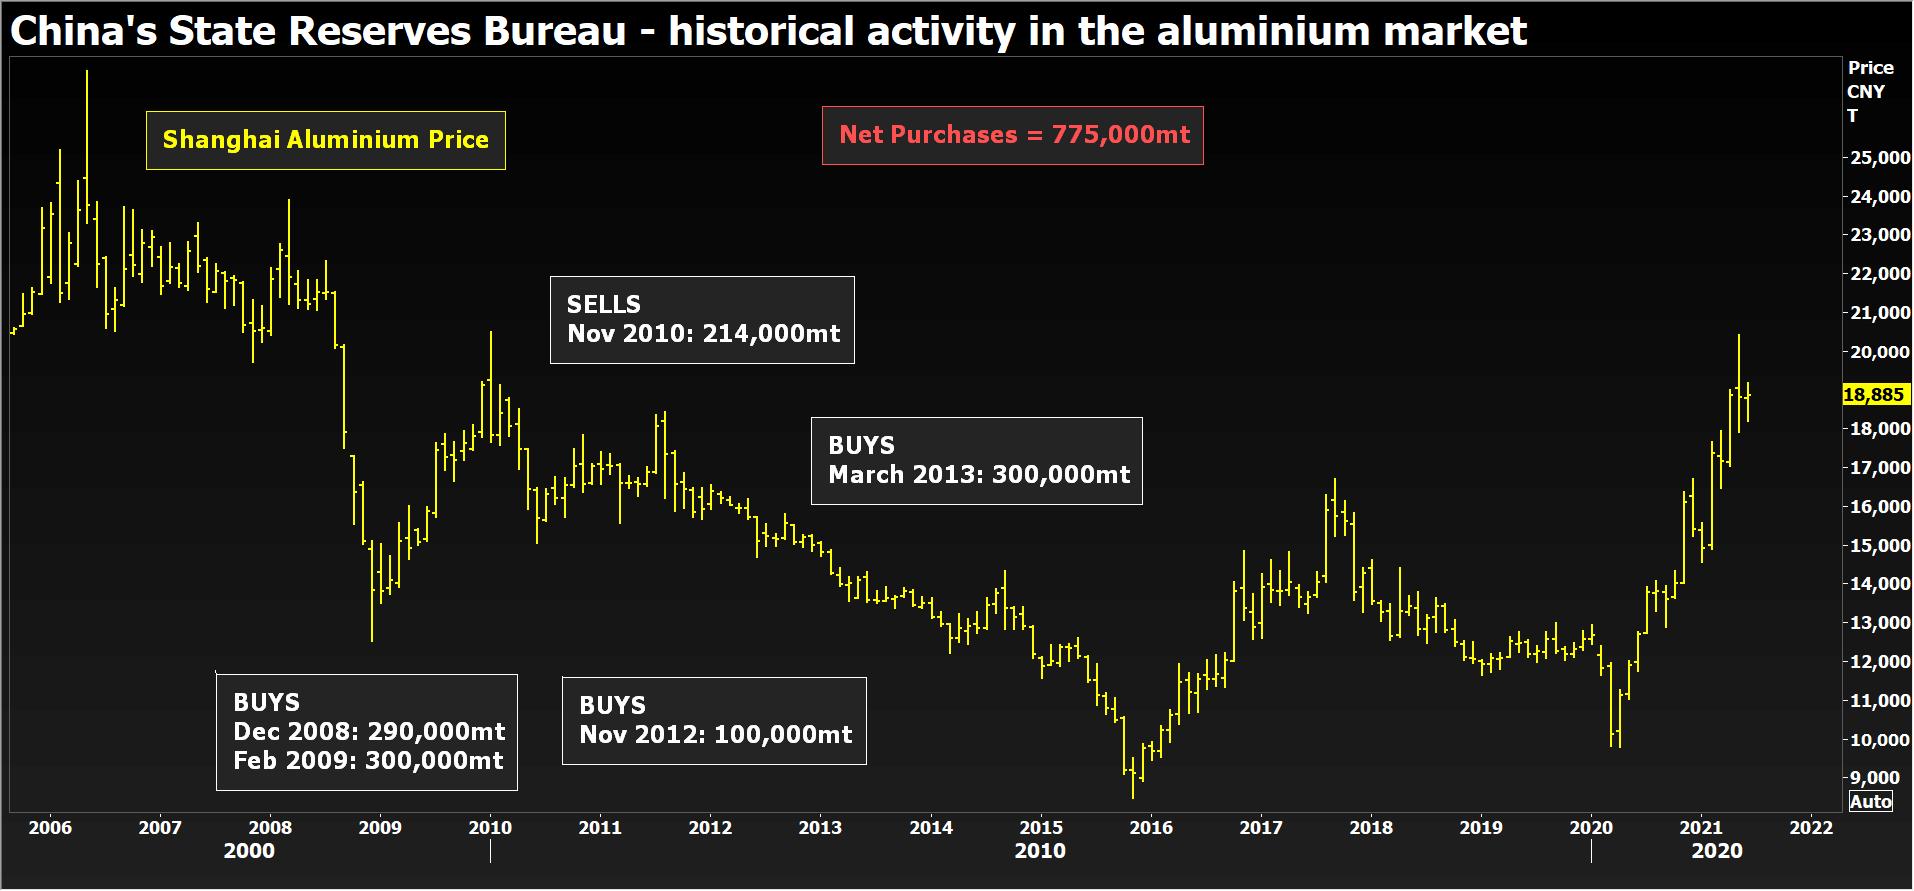 china historical activity in the aluminum market.